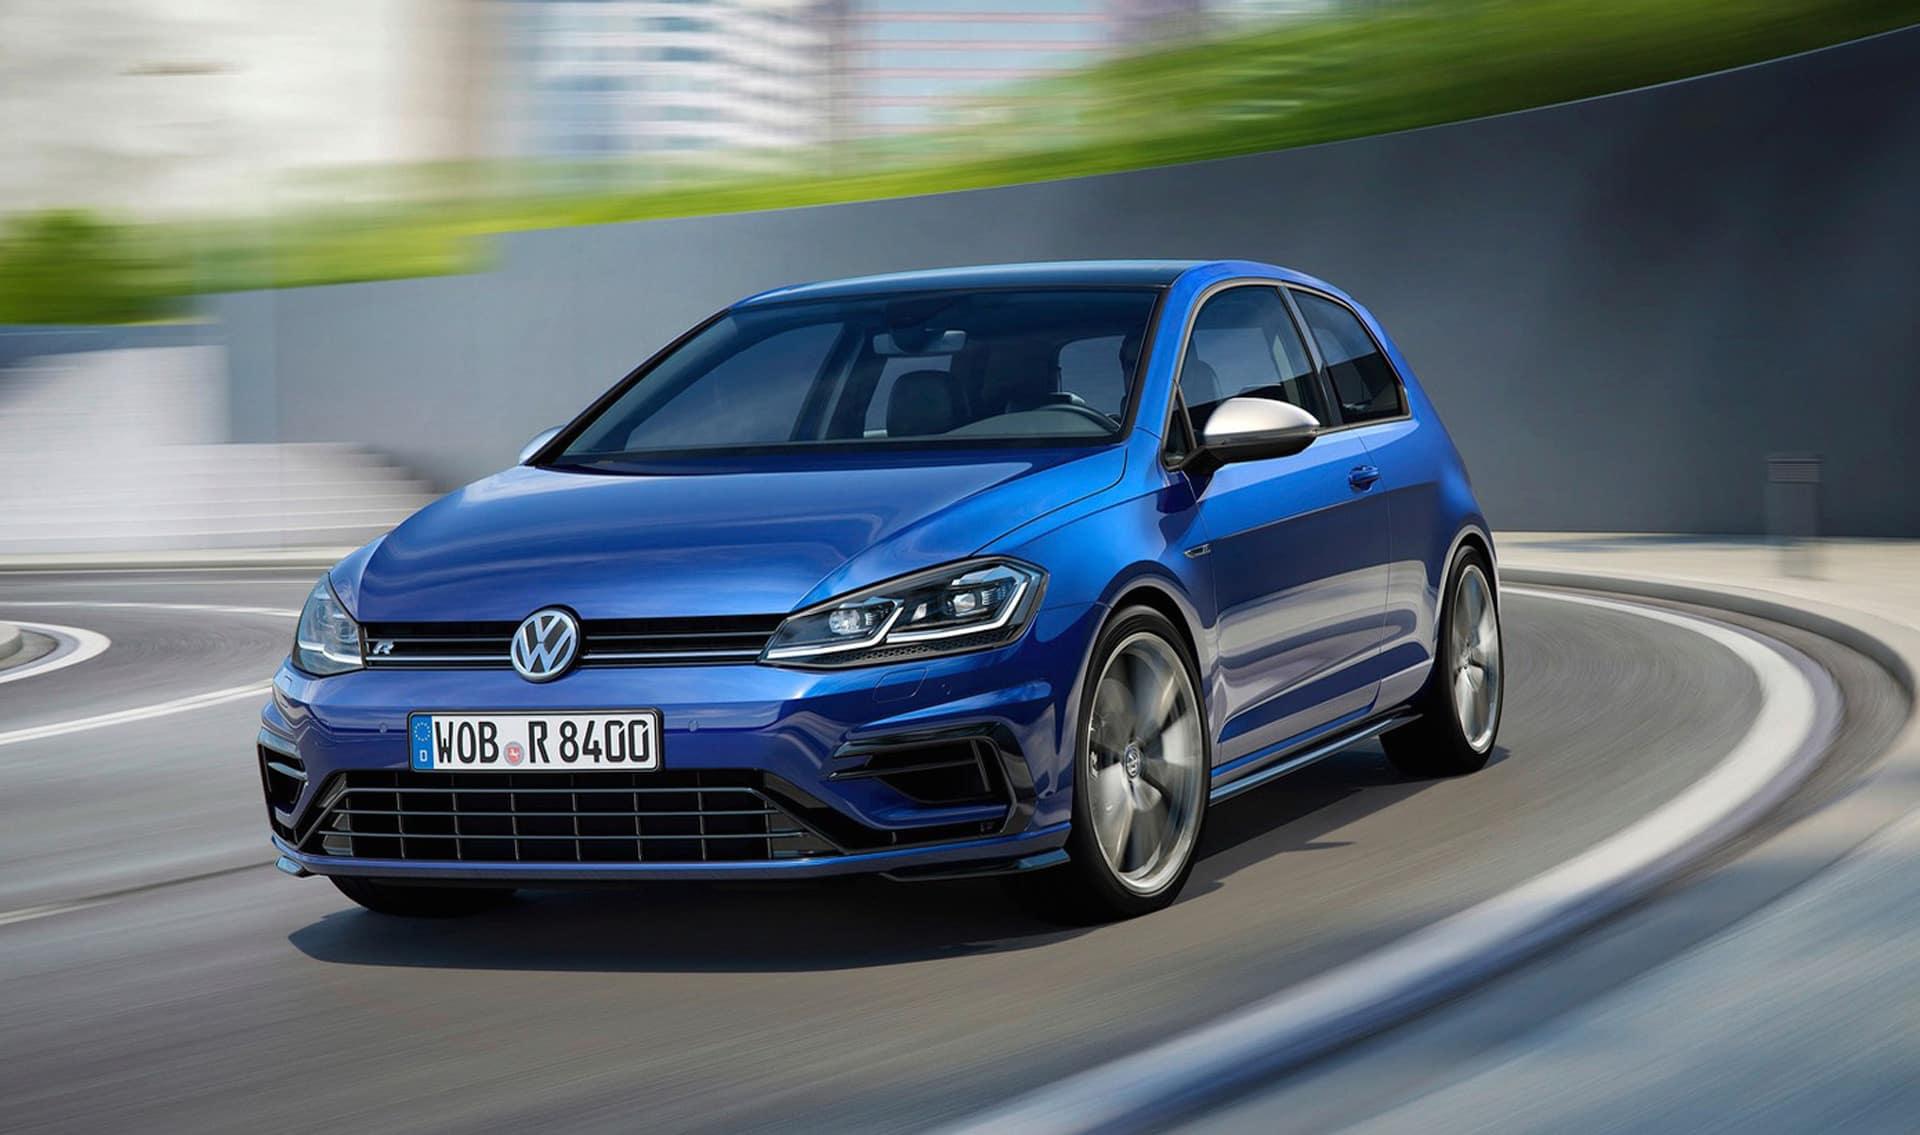 VW Lease Specials near Woodbridge